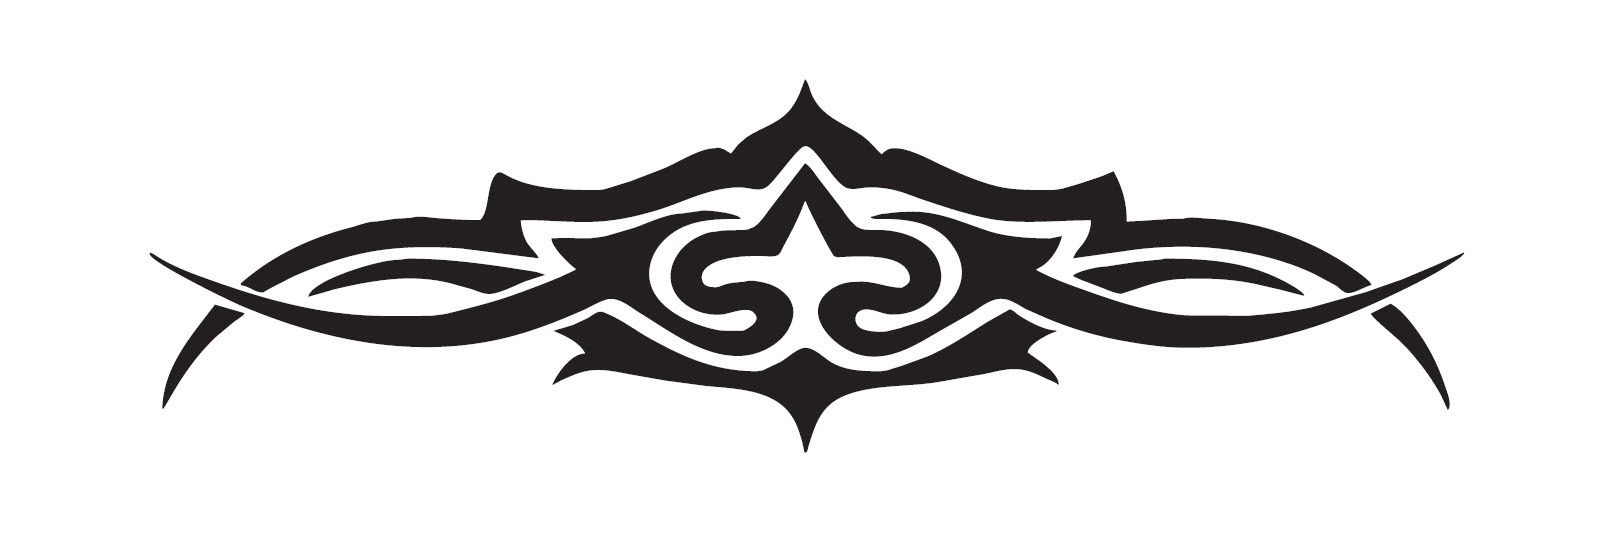 USA and International Orders: 100mm Hi Gloss Black Sticker. Classic Tattoo Design. Suitable for Bikes, Helmets etc. 000US1